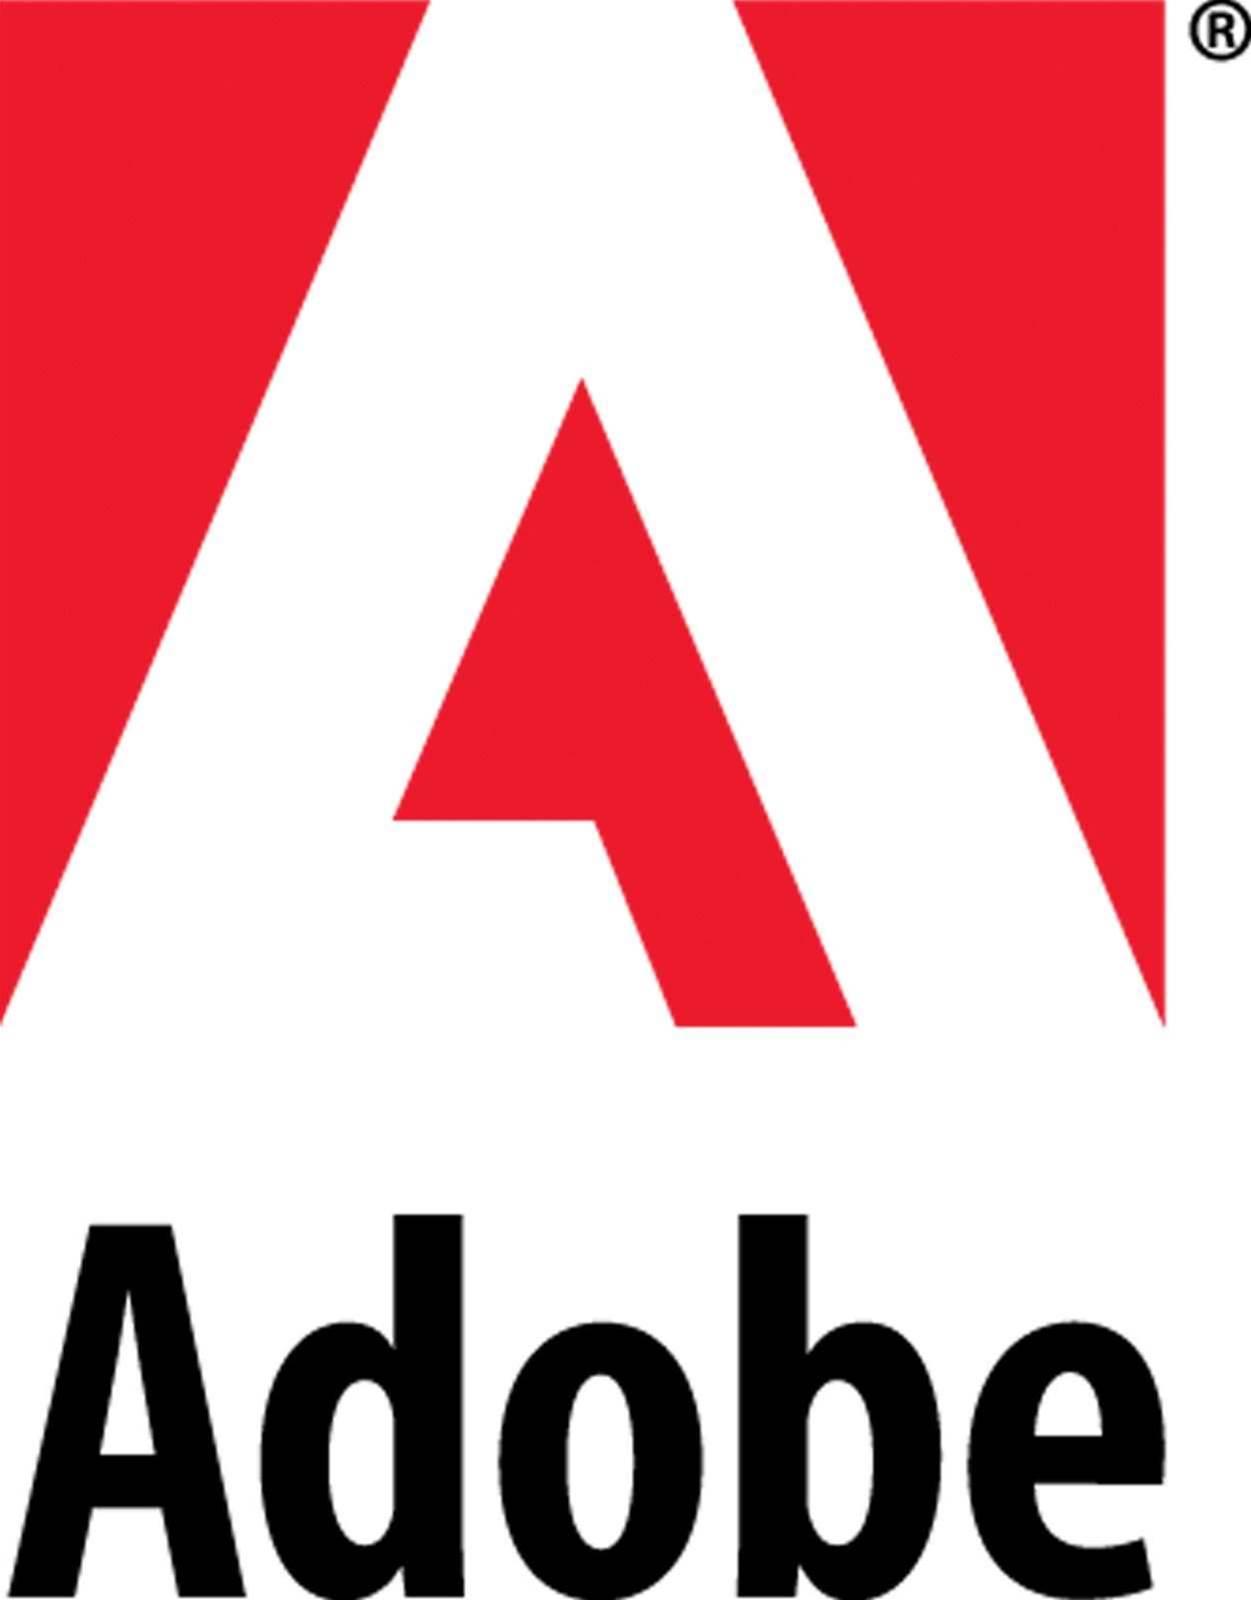 Adobe forum cracked, user details dumped